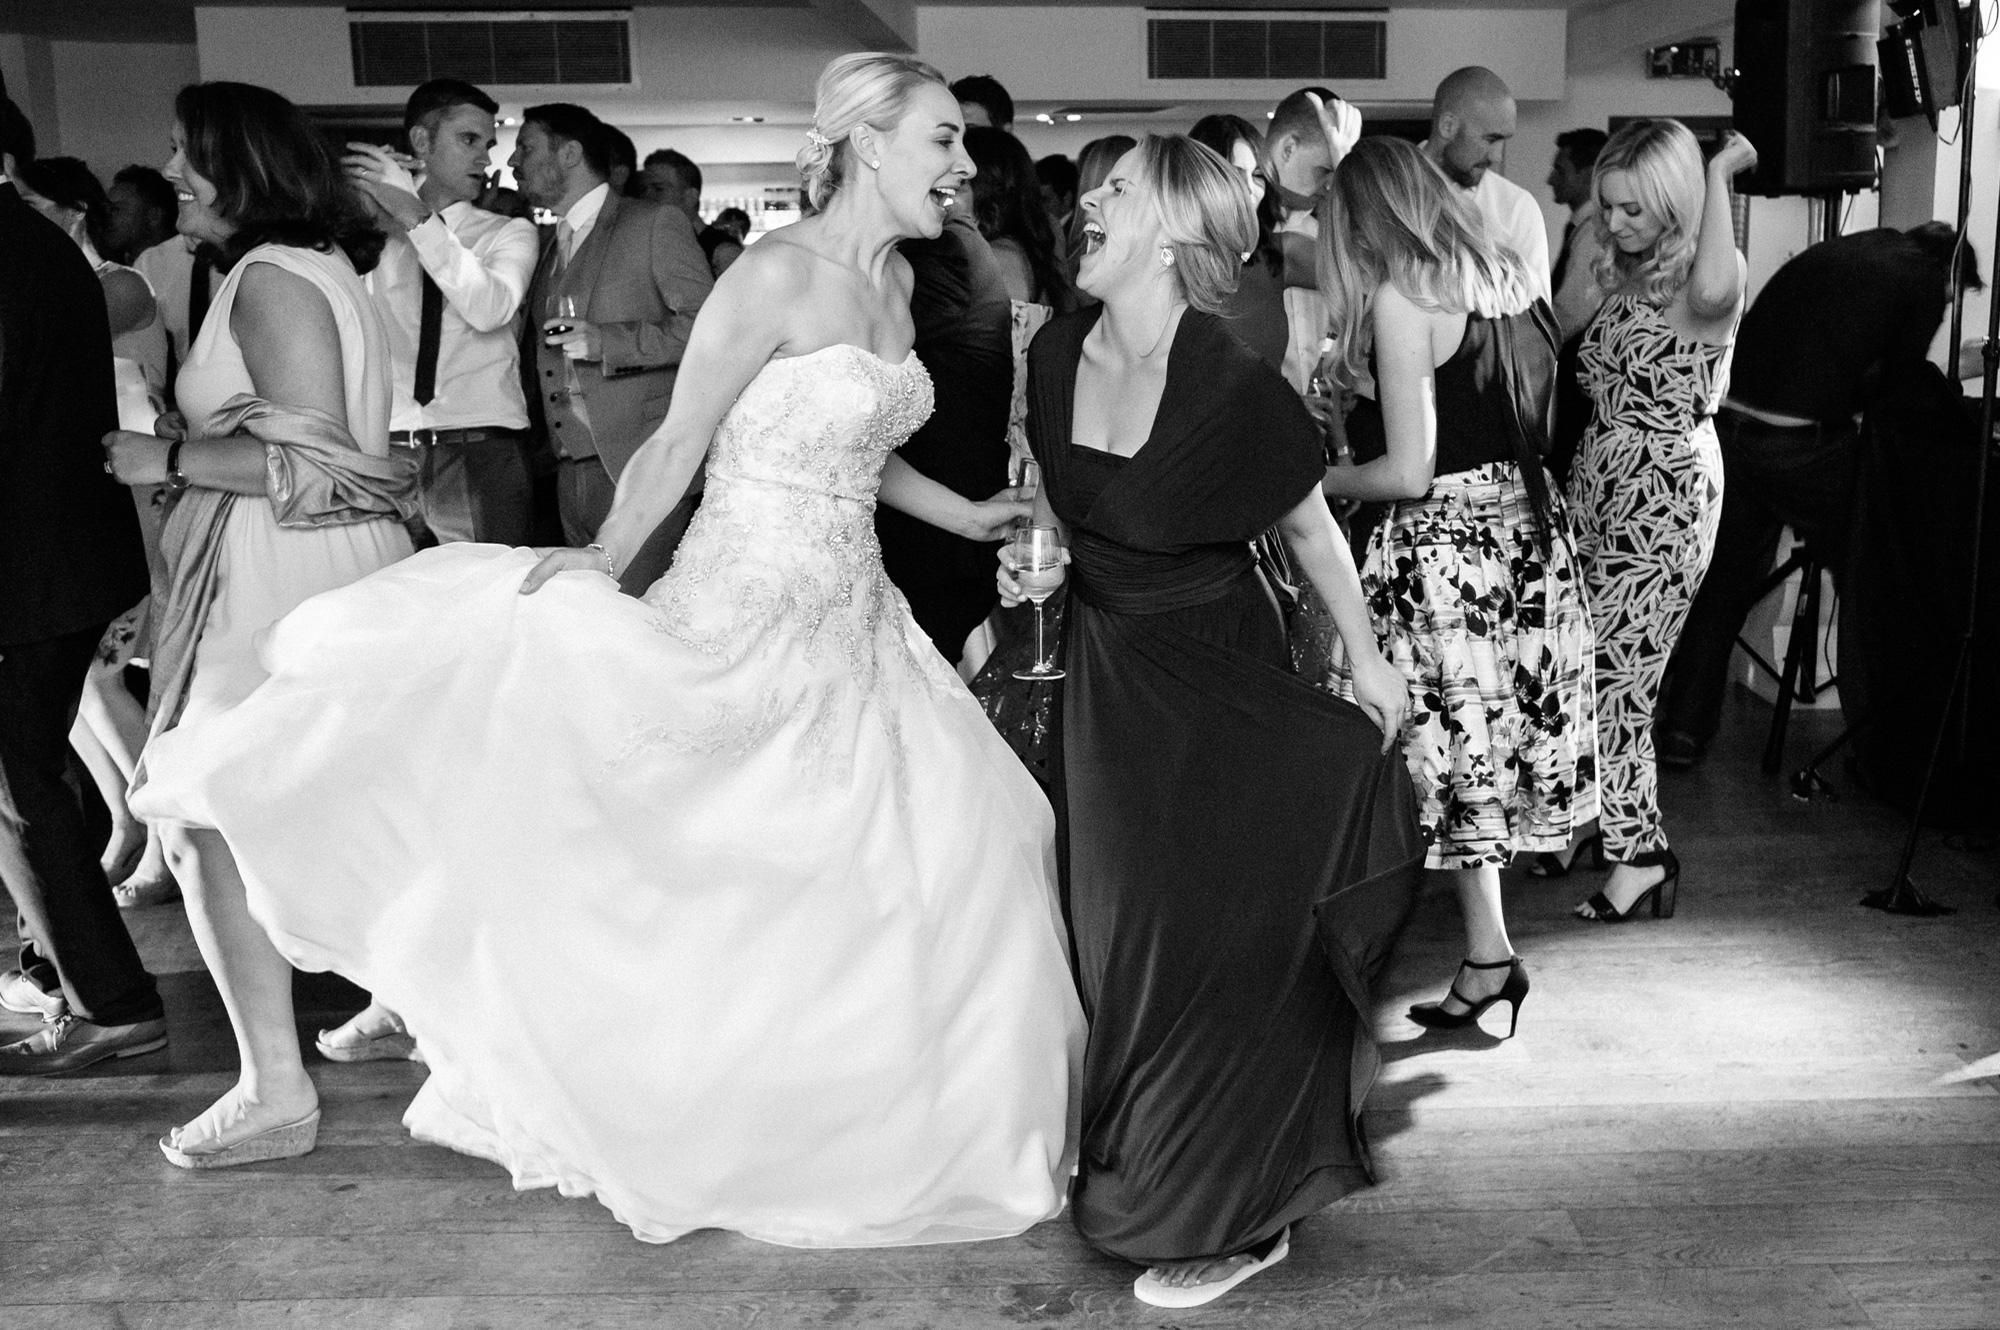 maid of honour duties ibiza wedding bride bridesmaid dancing